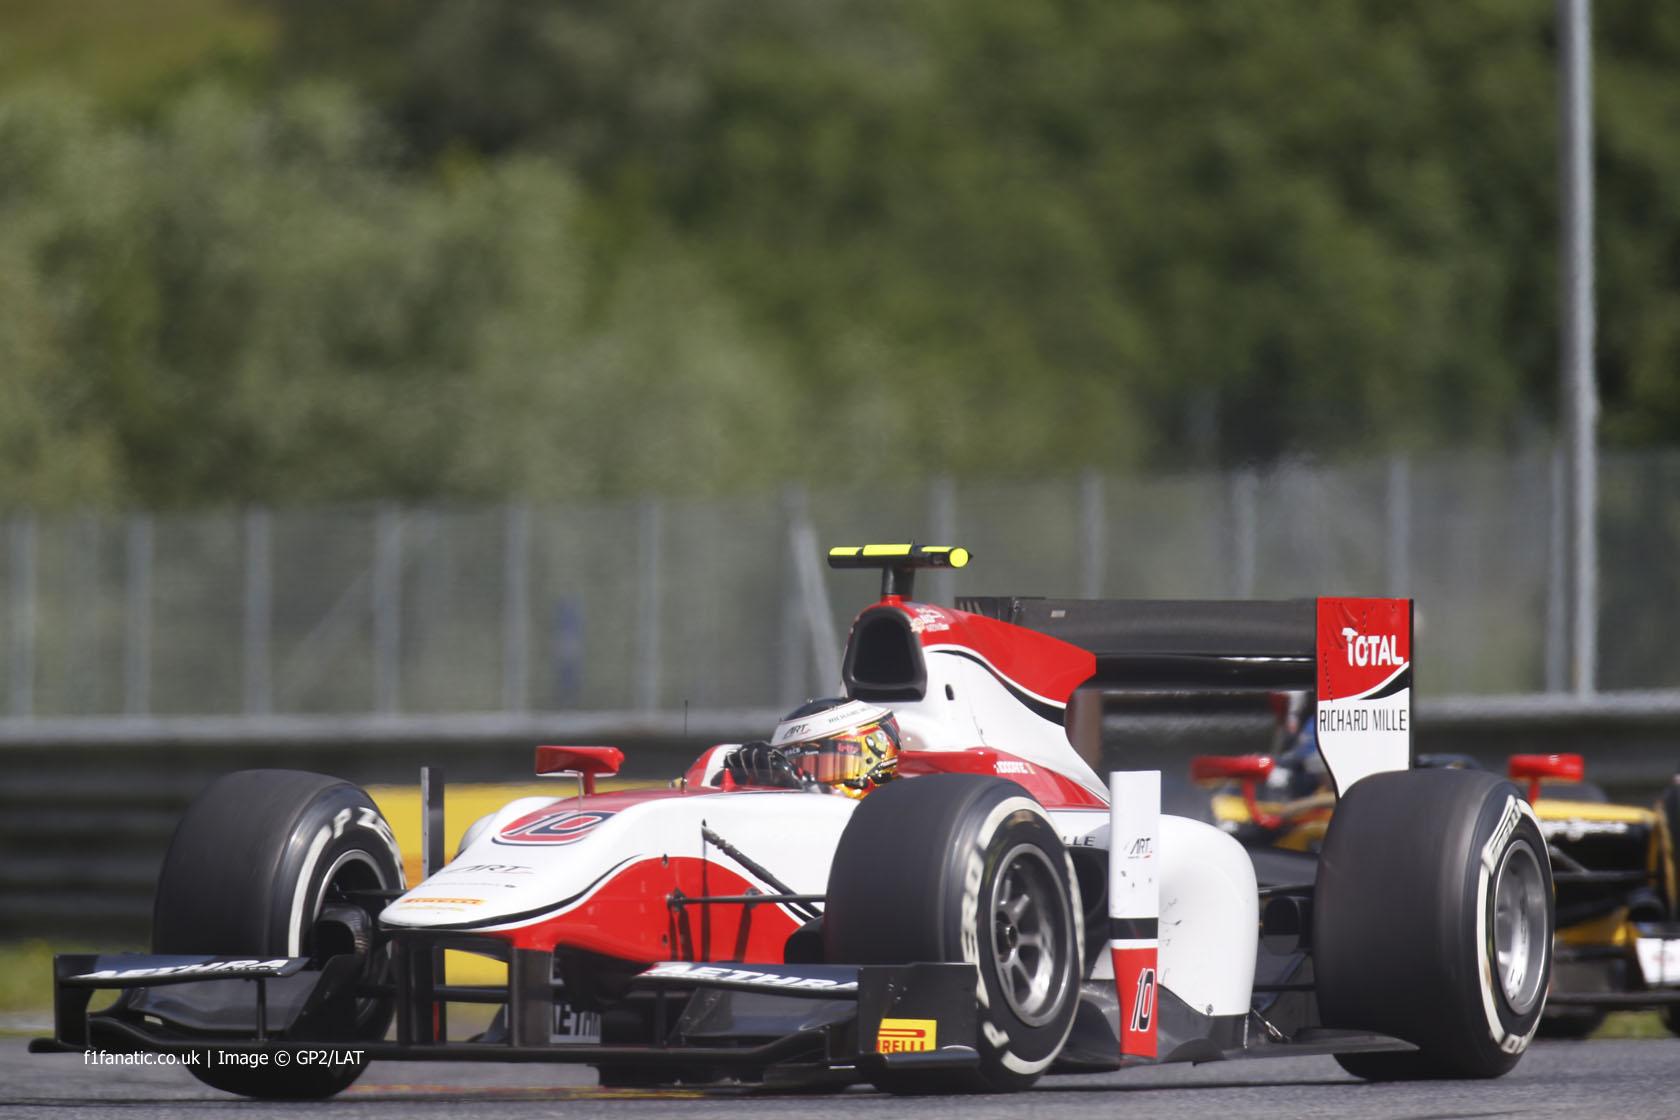 Stoffel Vandoorne, ART, GP2, Red Bull Ring, 2014, 2